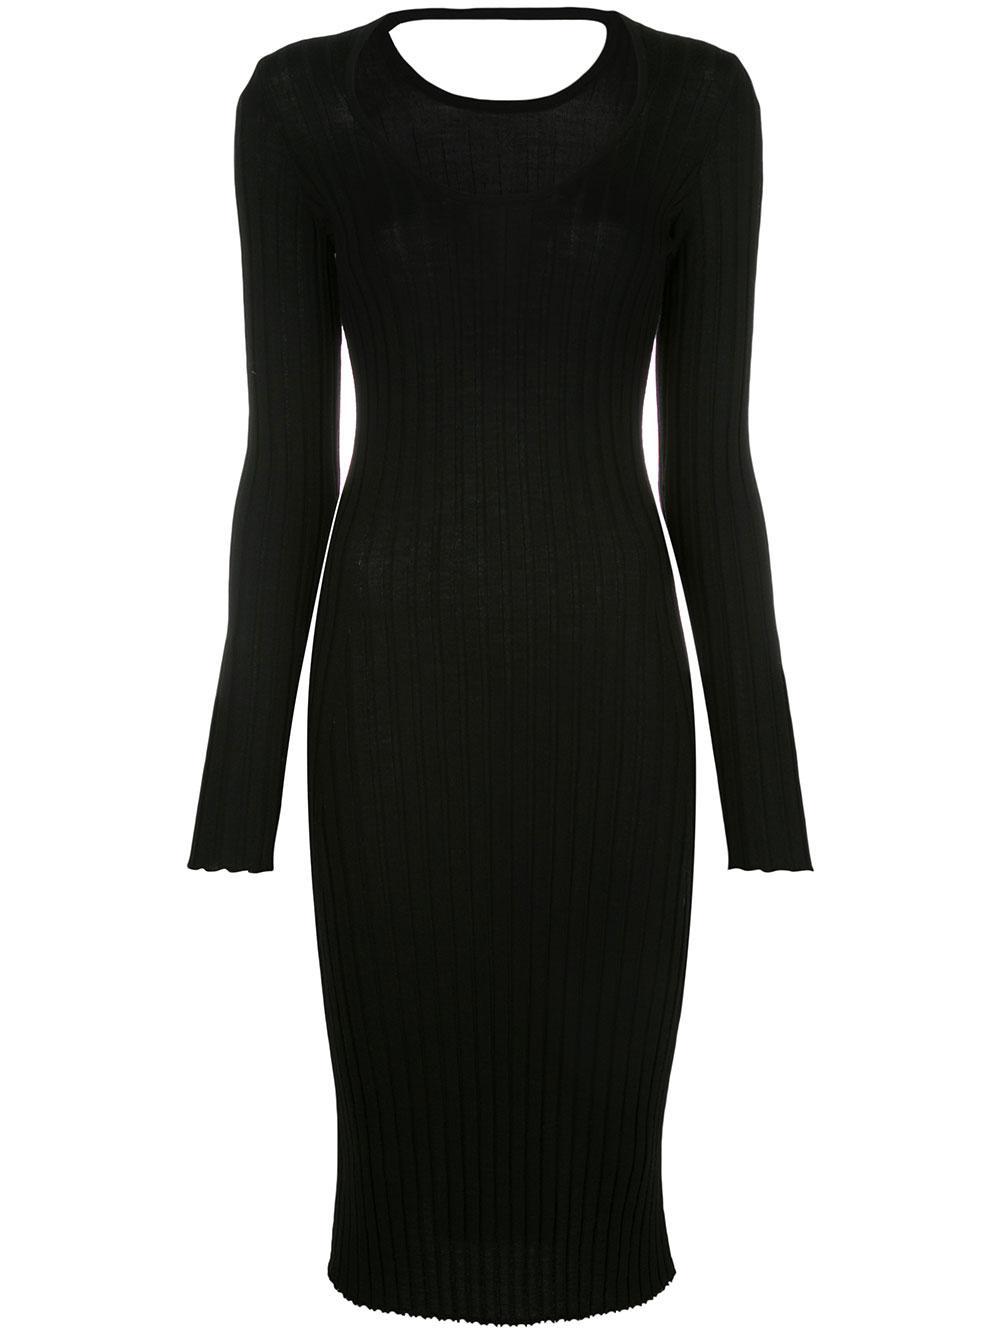 Long Sleeve Knit Midi Dress Item # 1101025